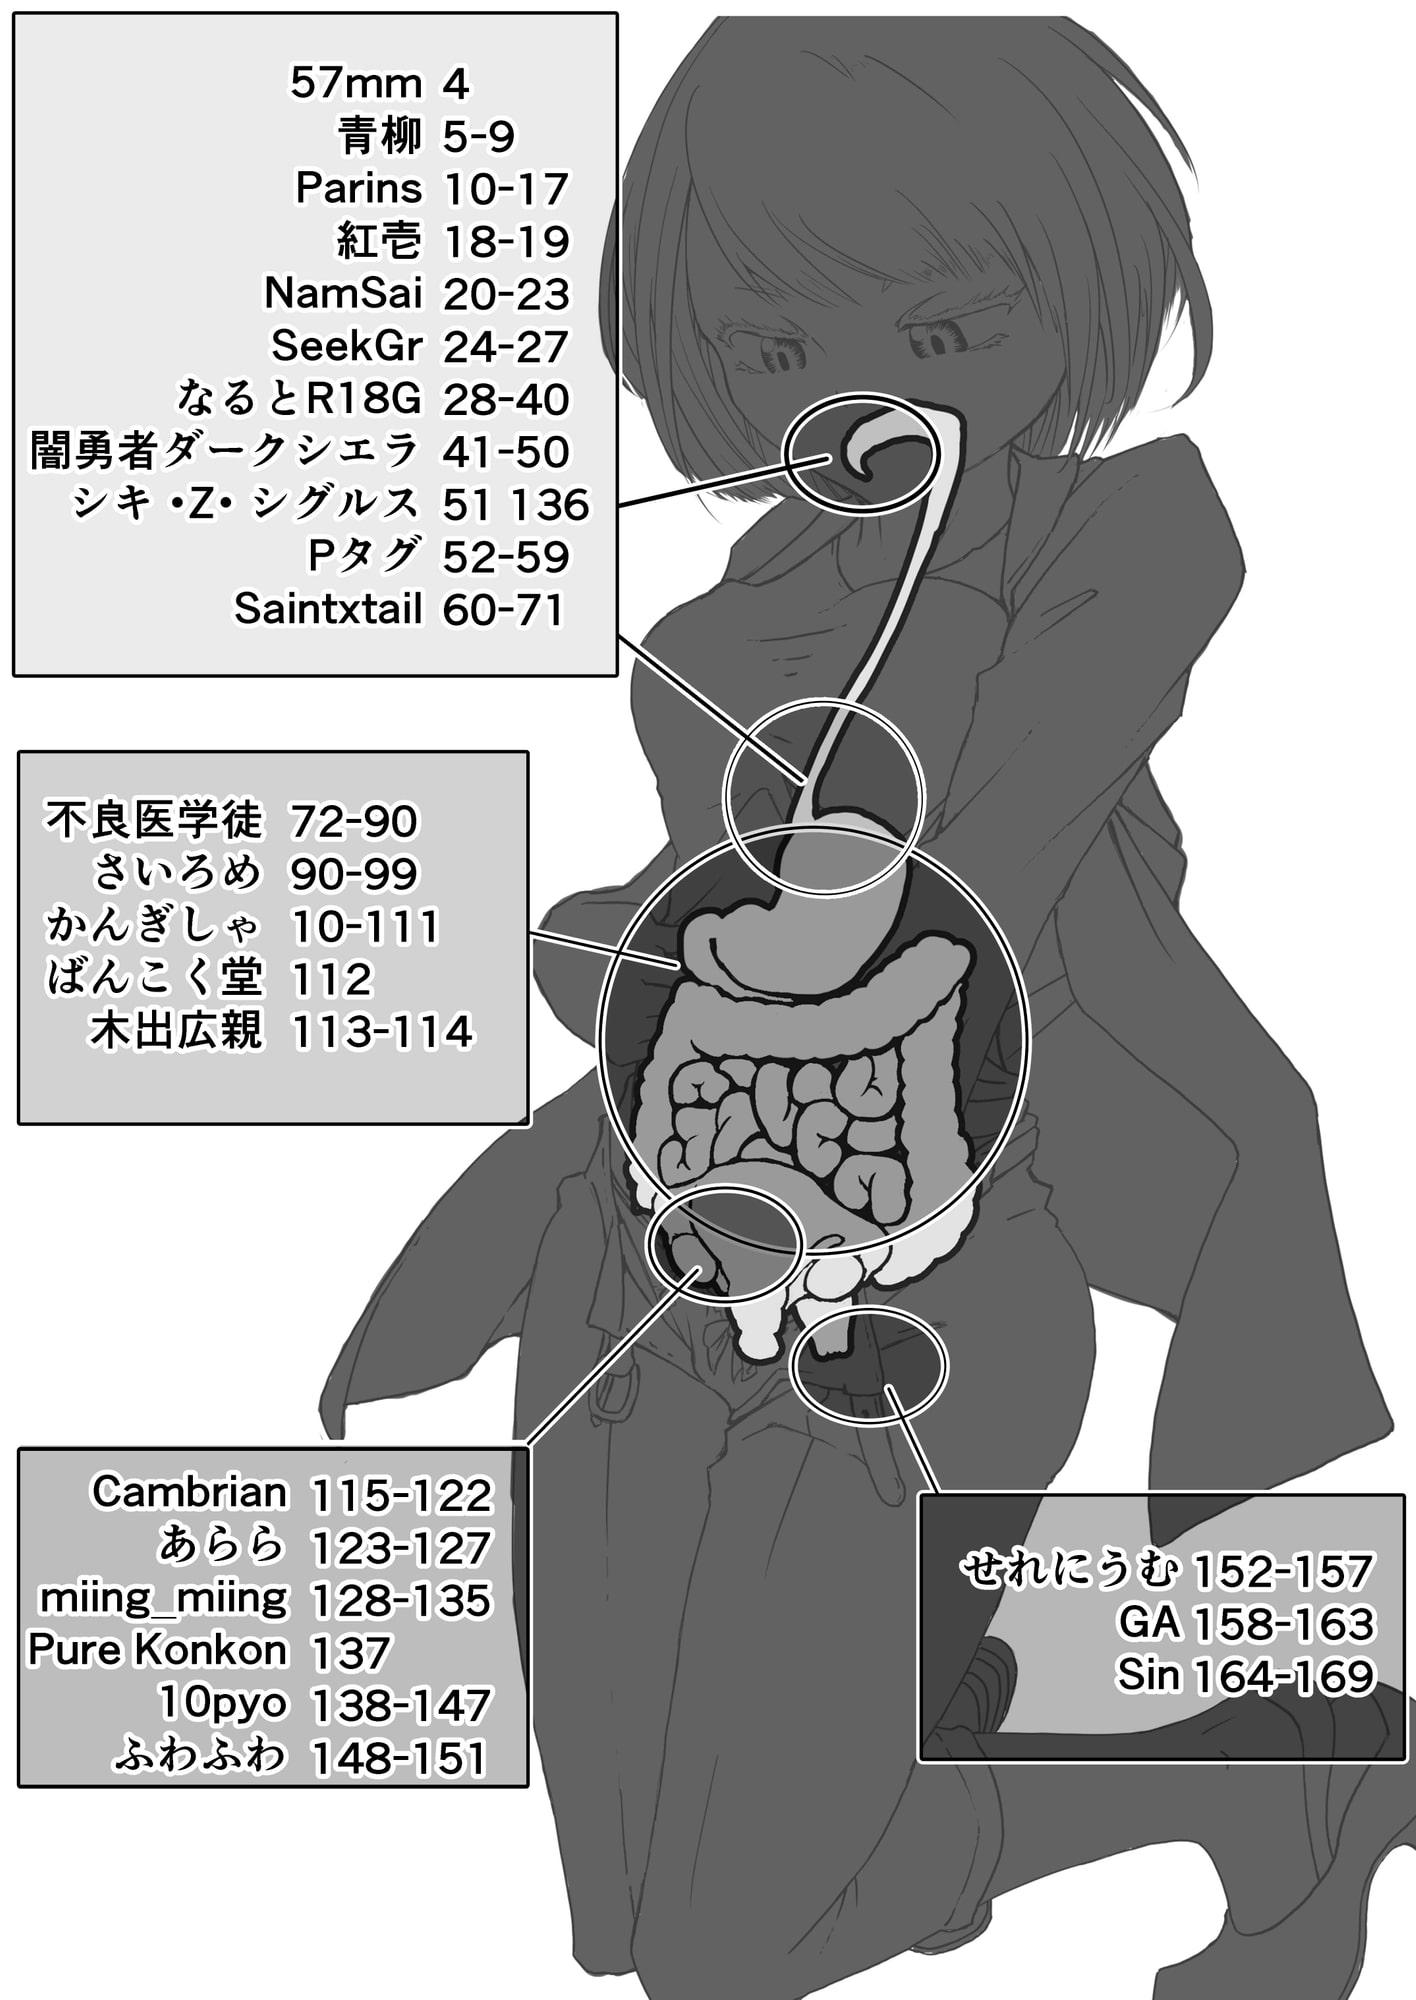 RJ327184 体内・肉壁合同誌 腸内会誌3-B [20210512]